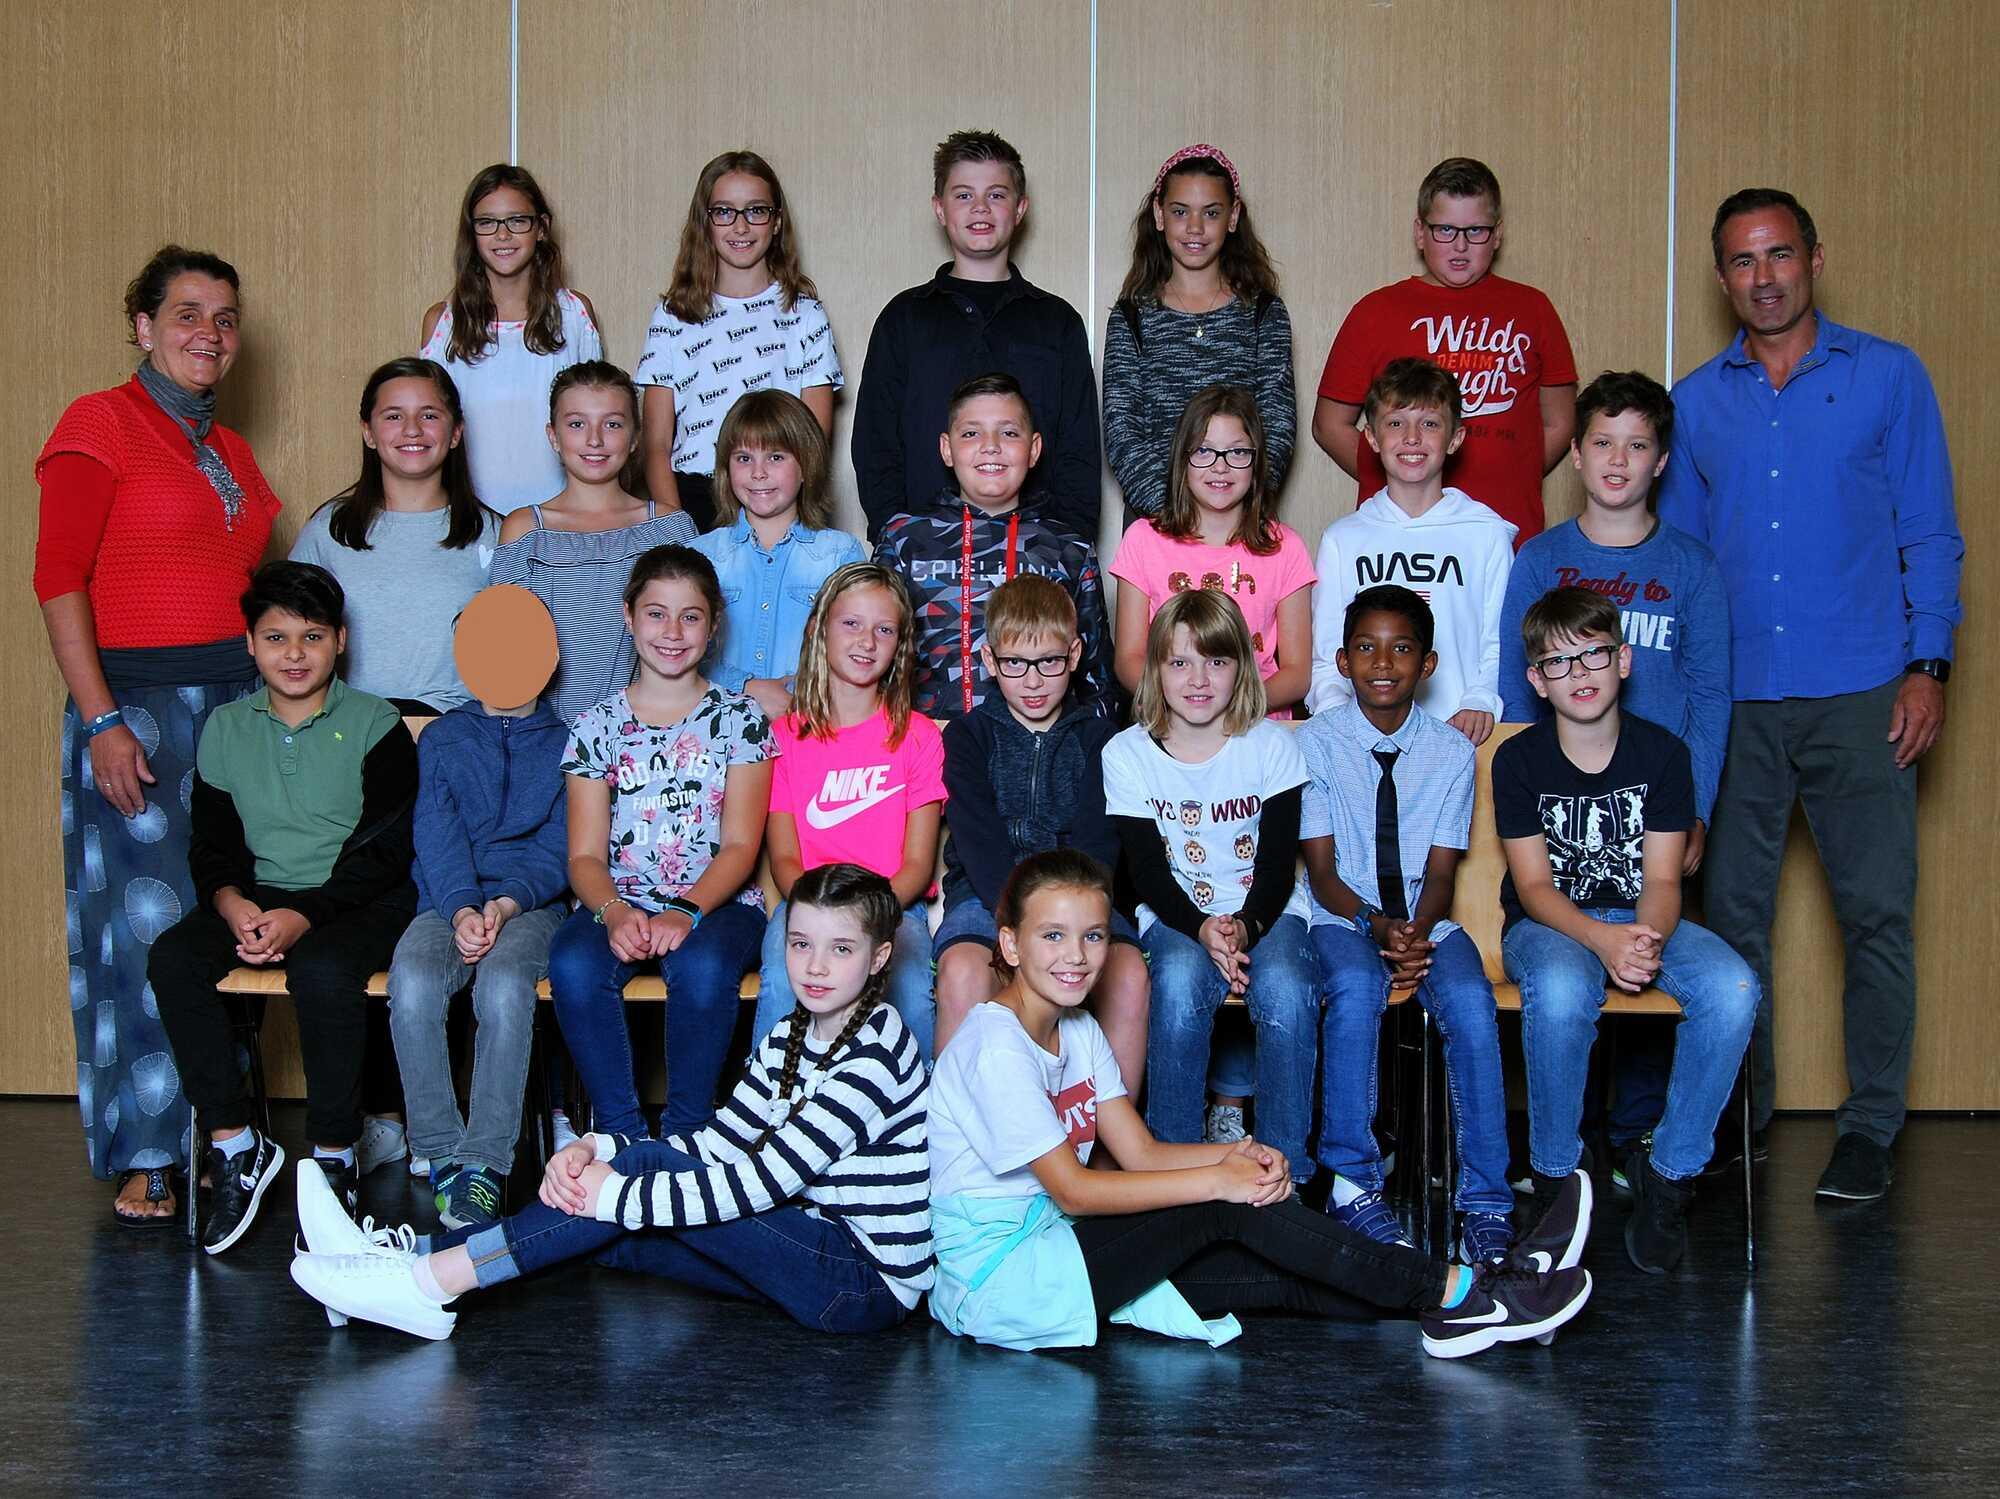 Klasse 6b - Herr Guht